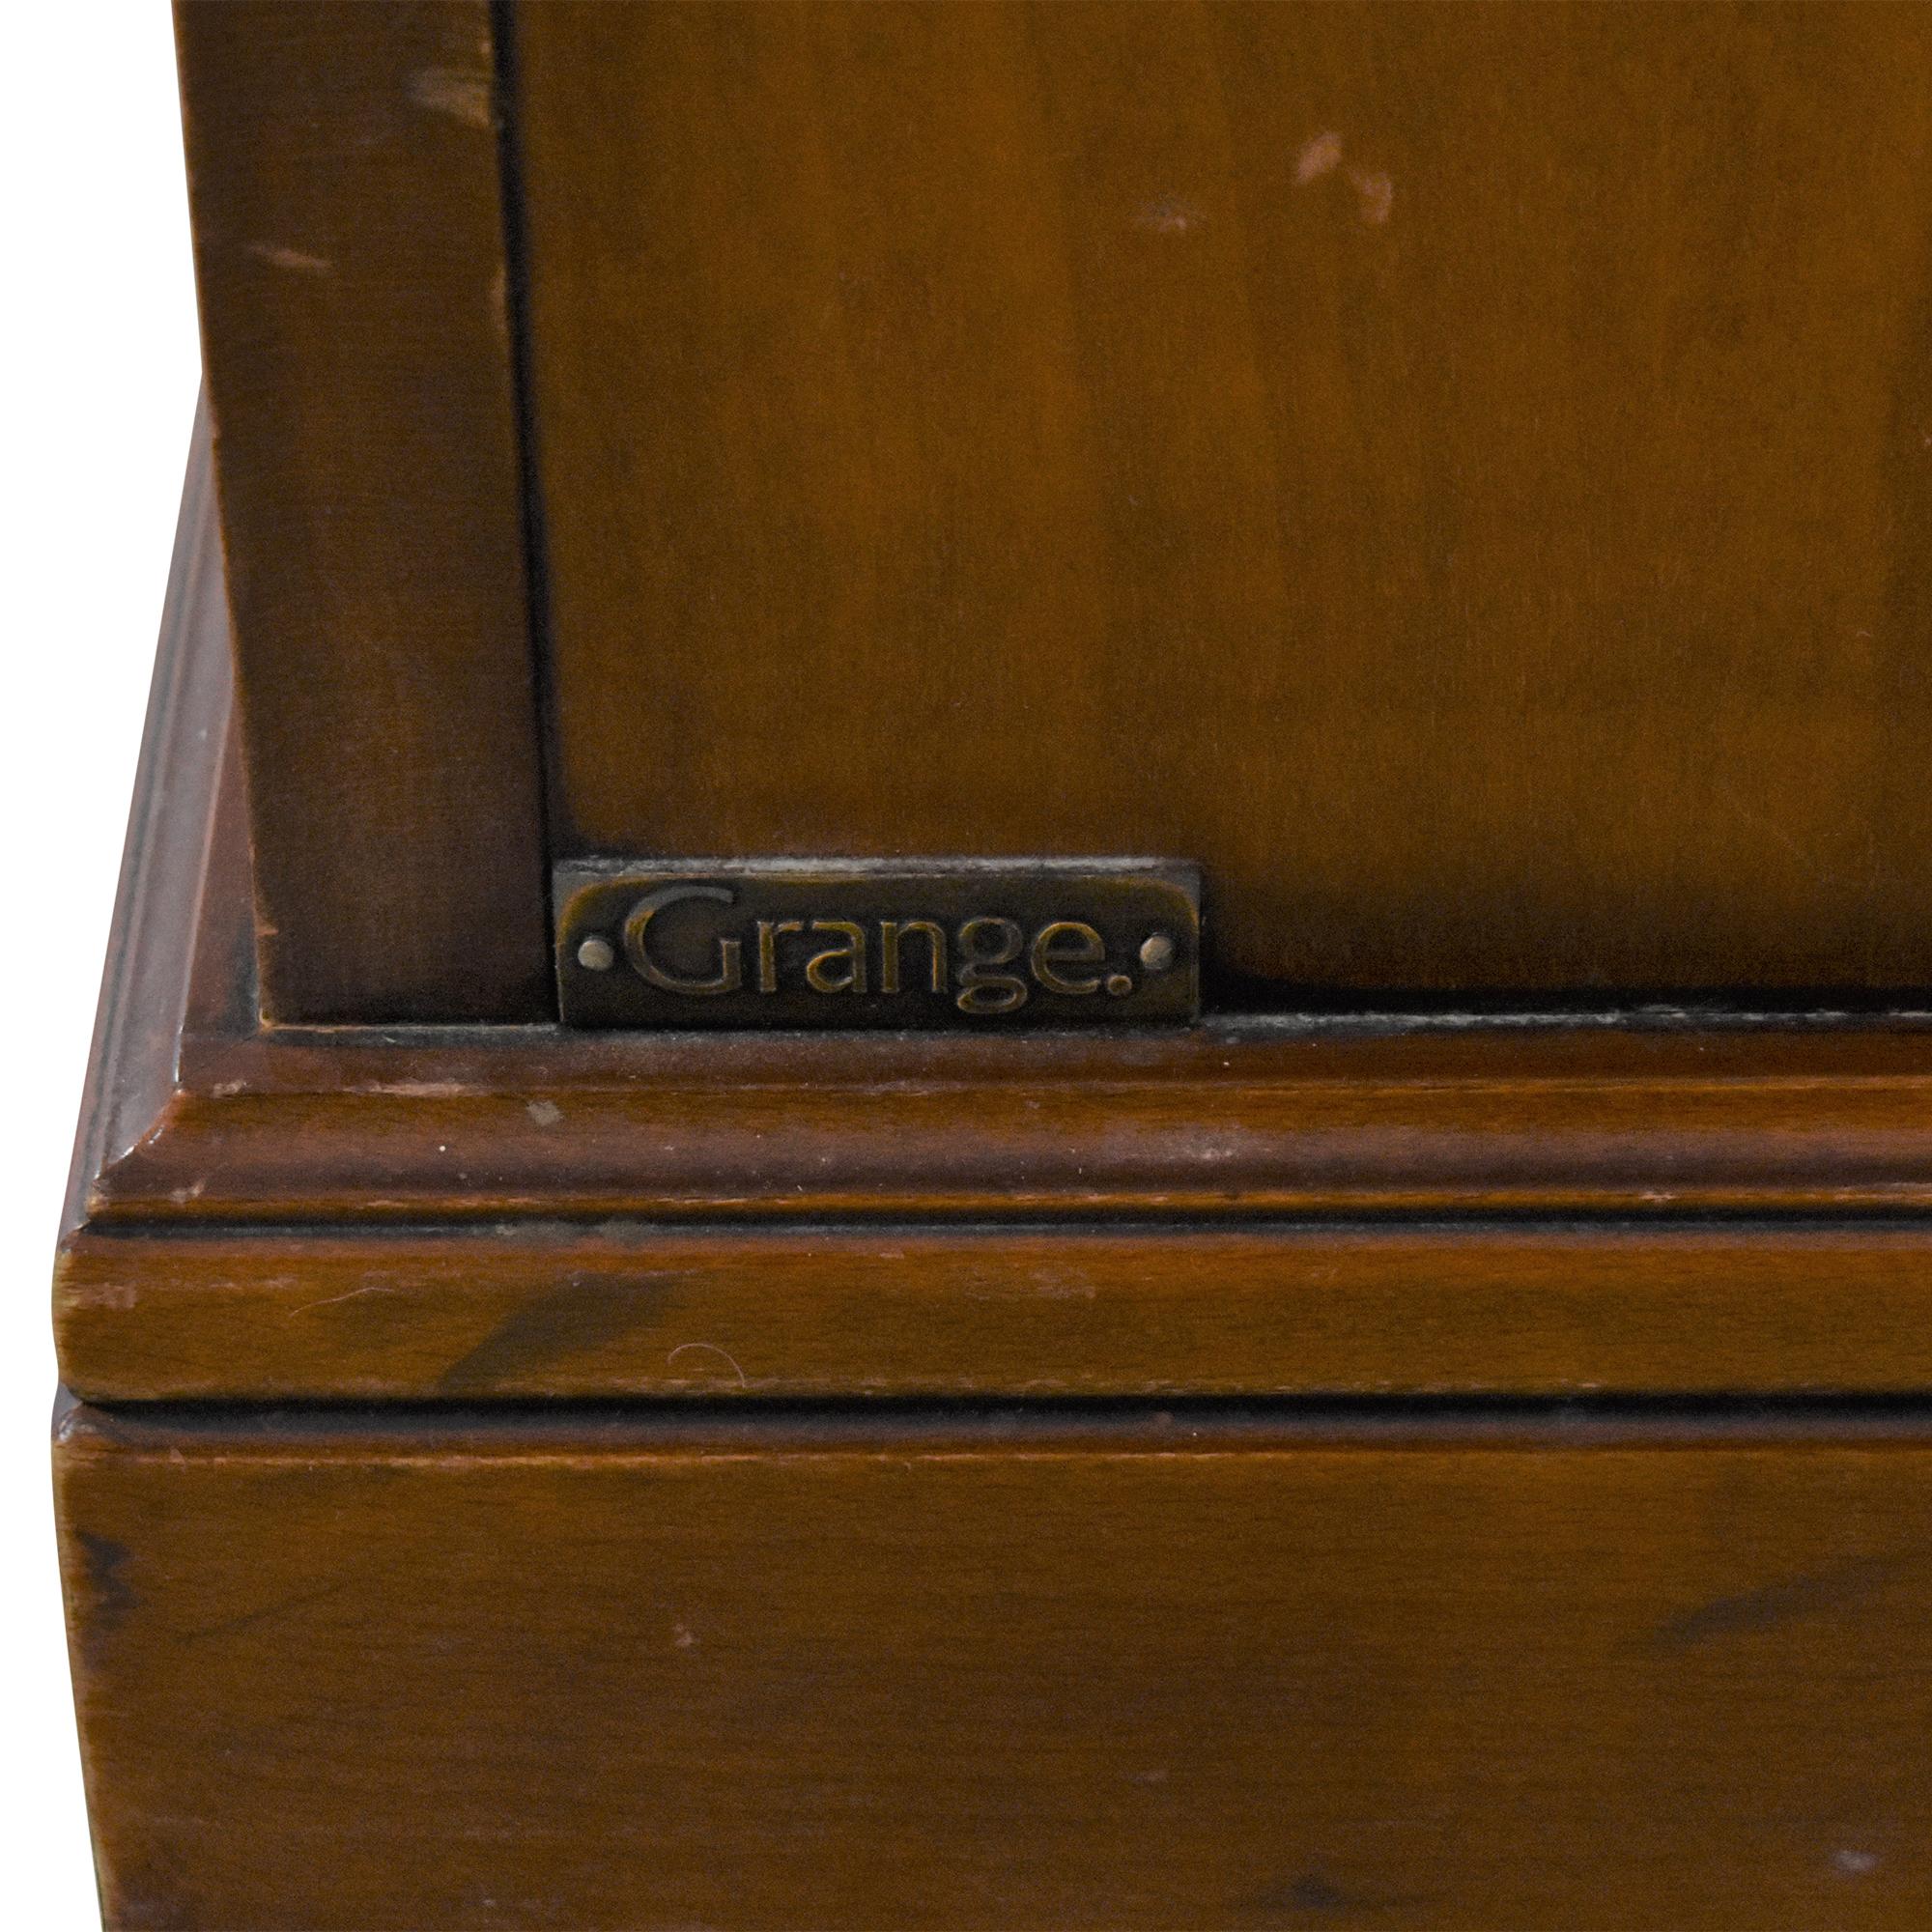 Grange Grange Tall Bookcases Storage